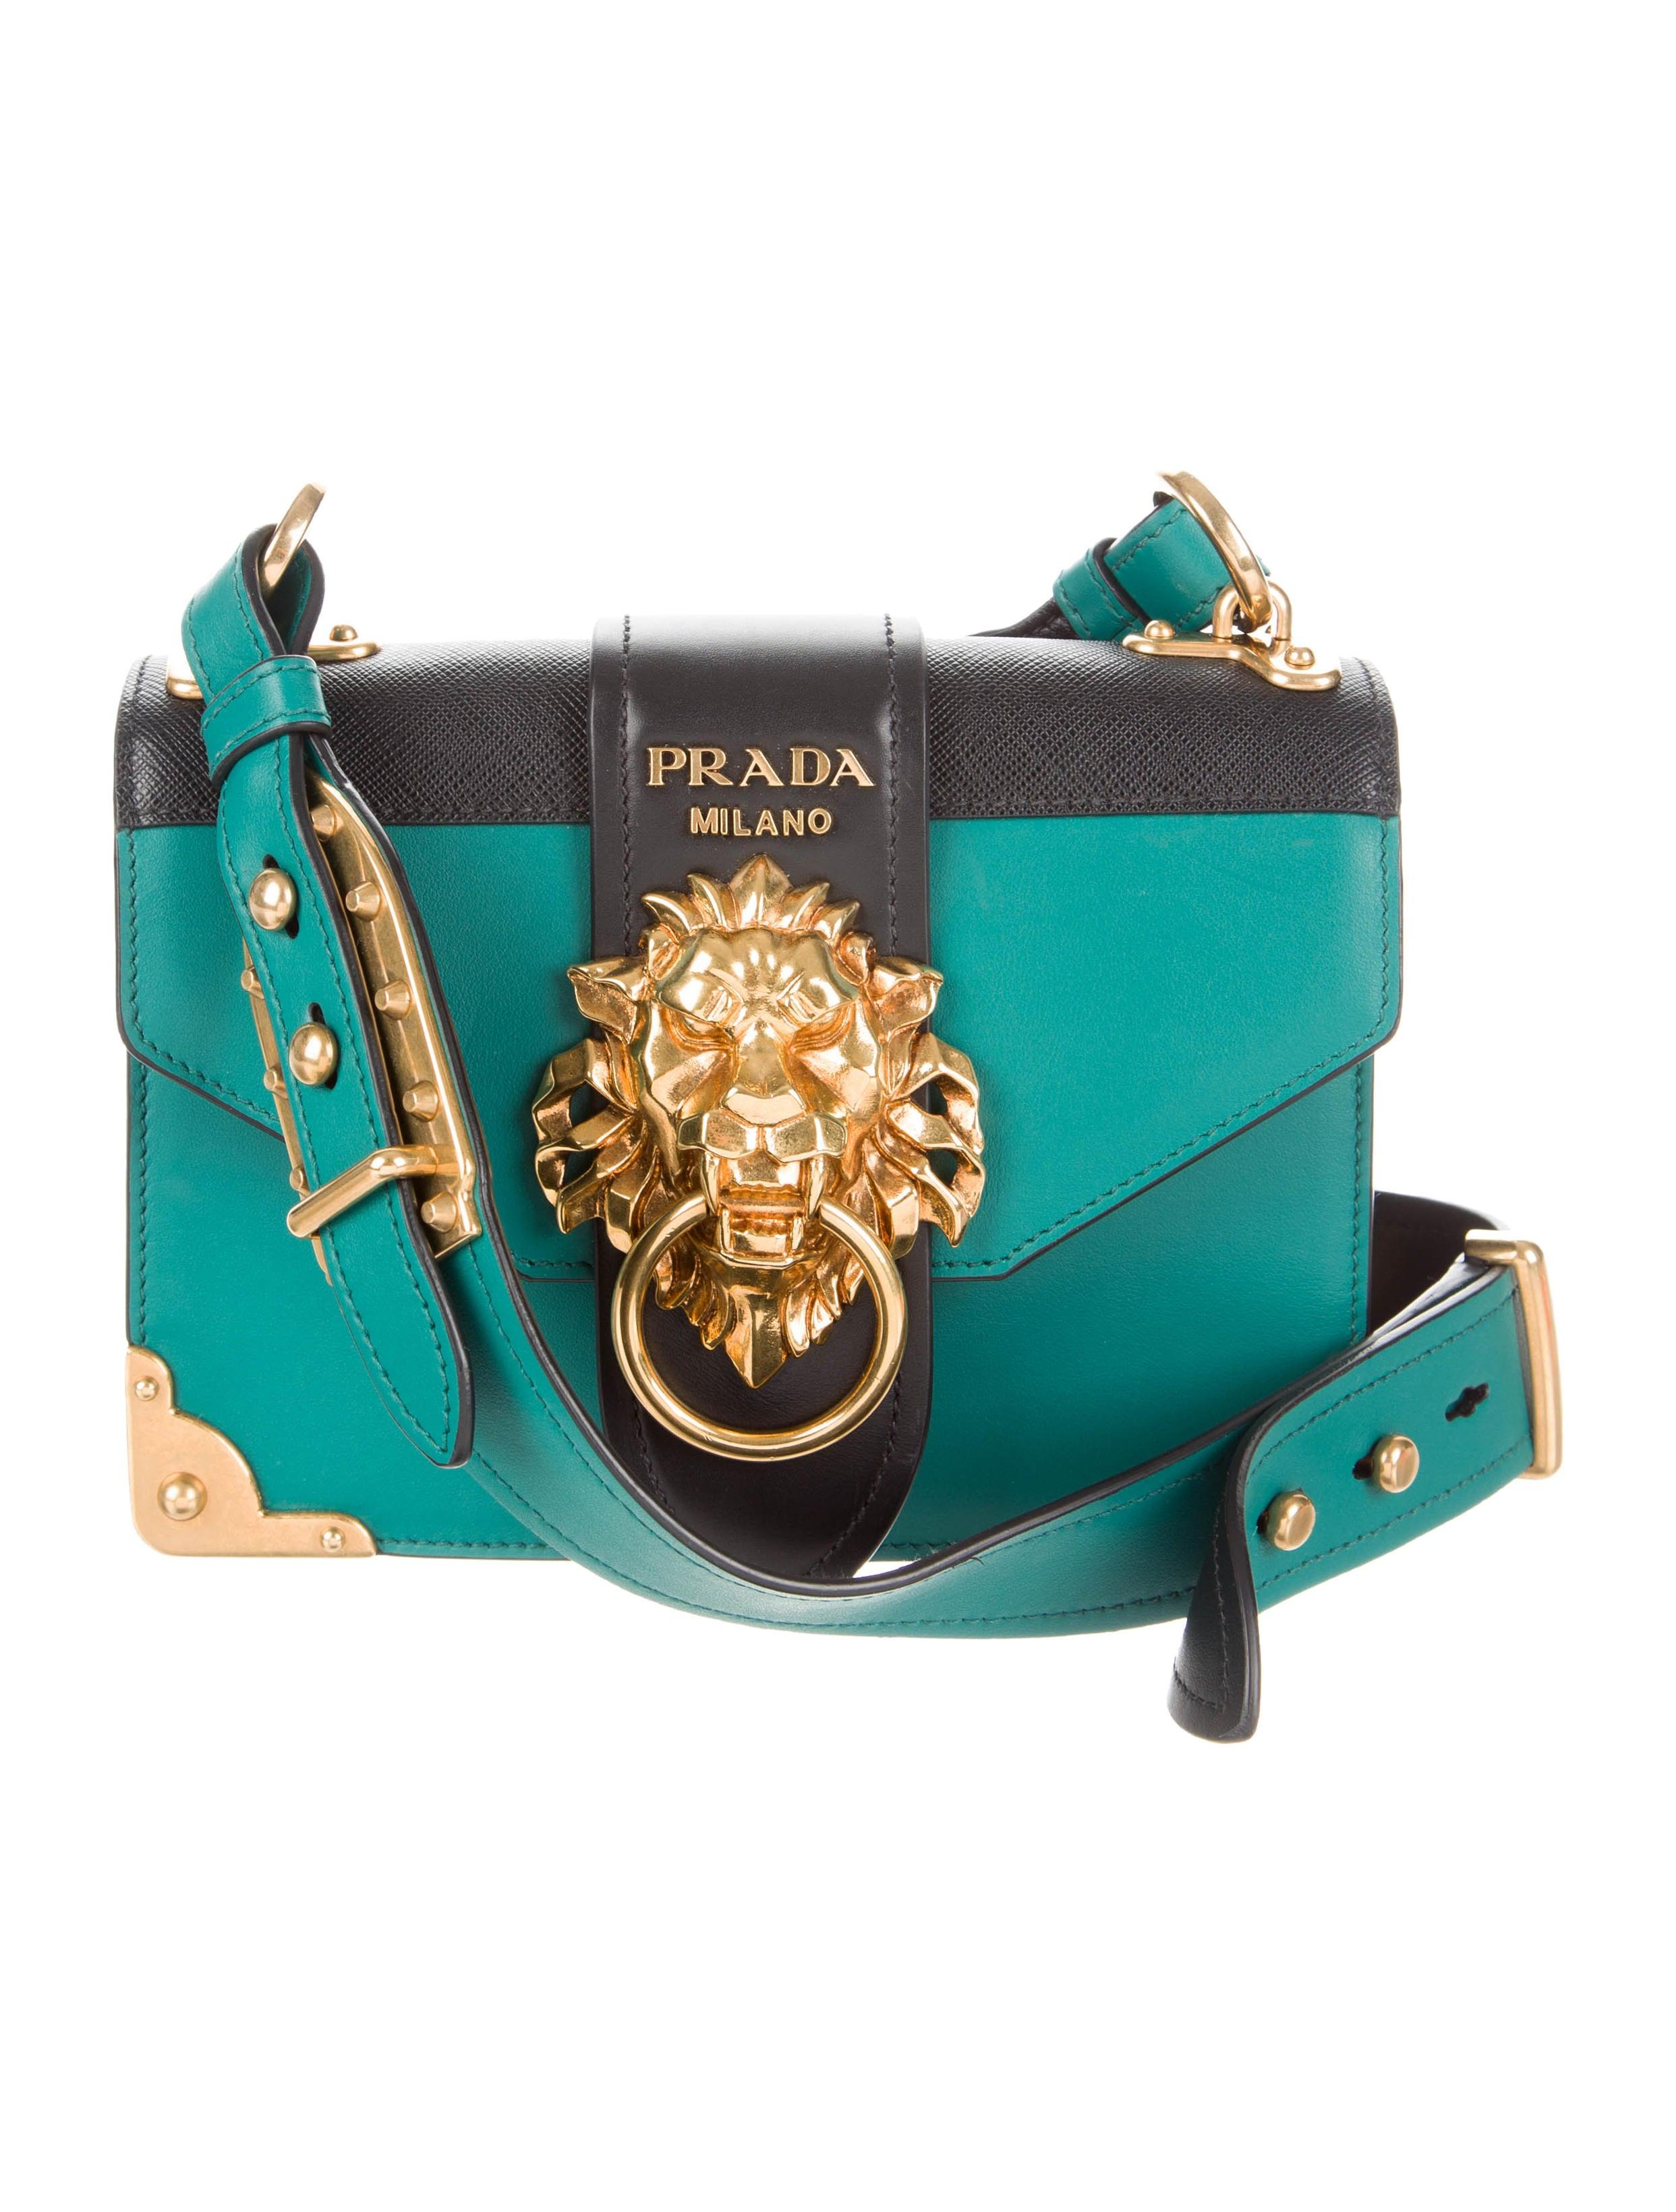 ab97f1e0d13d Prada 2017 Animalier Cahier Bag - Handbags - PRA187591 | The RealReal